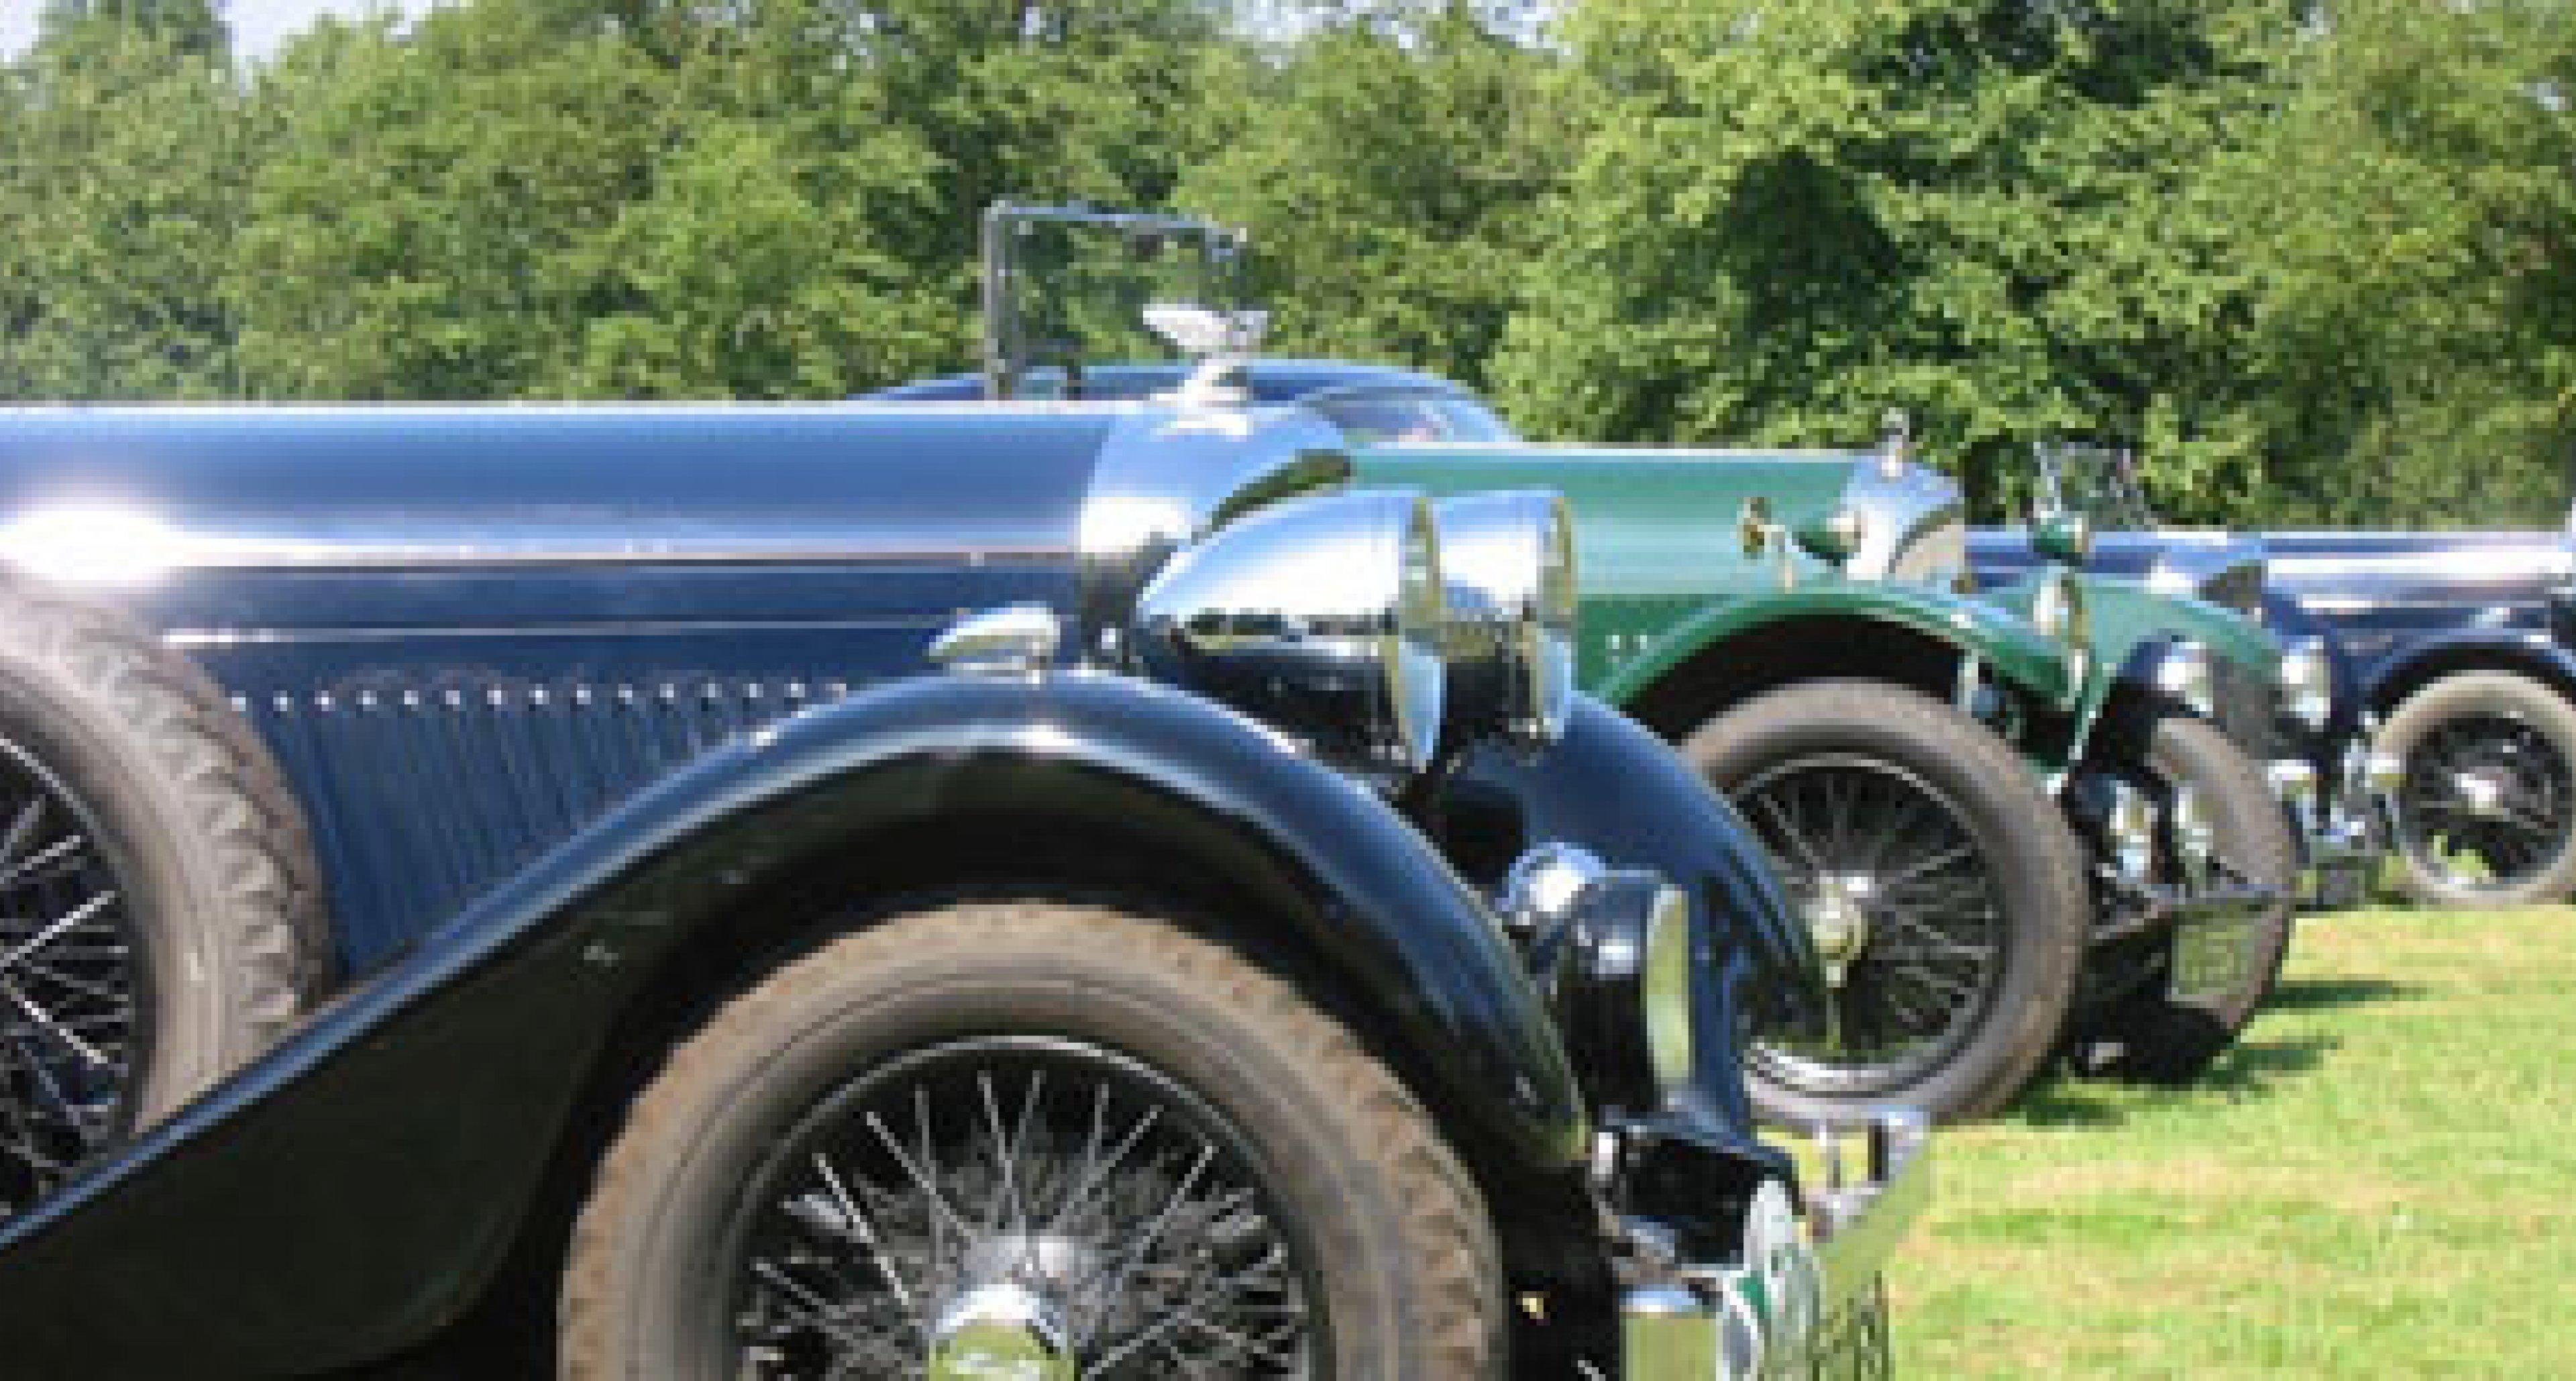 Bentley Drivers Club at Hatfield House